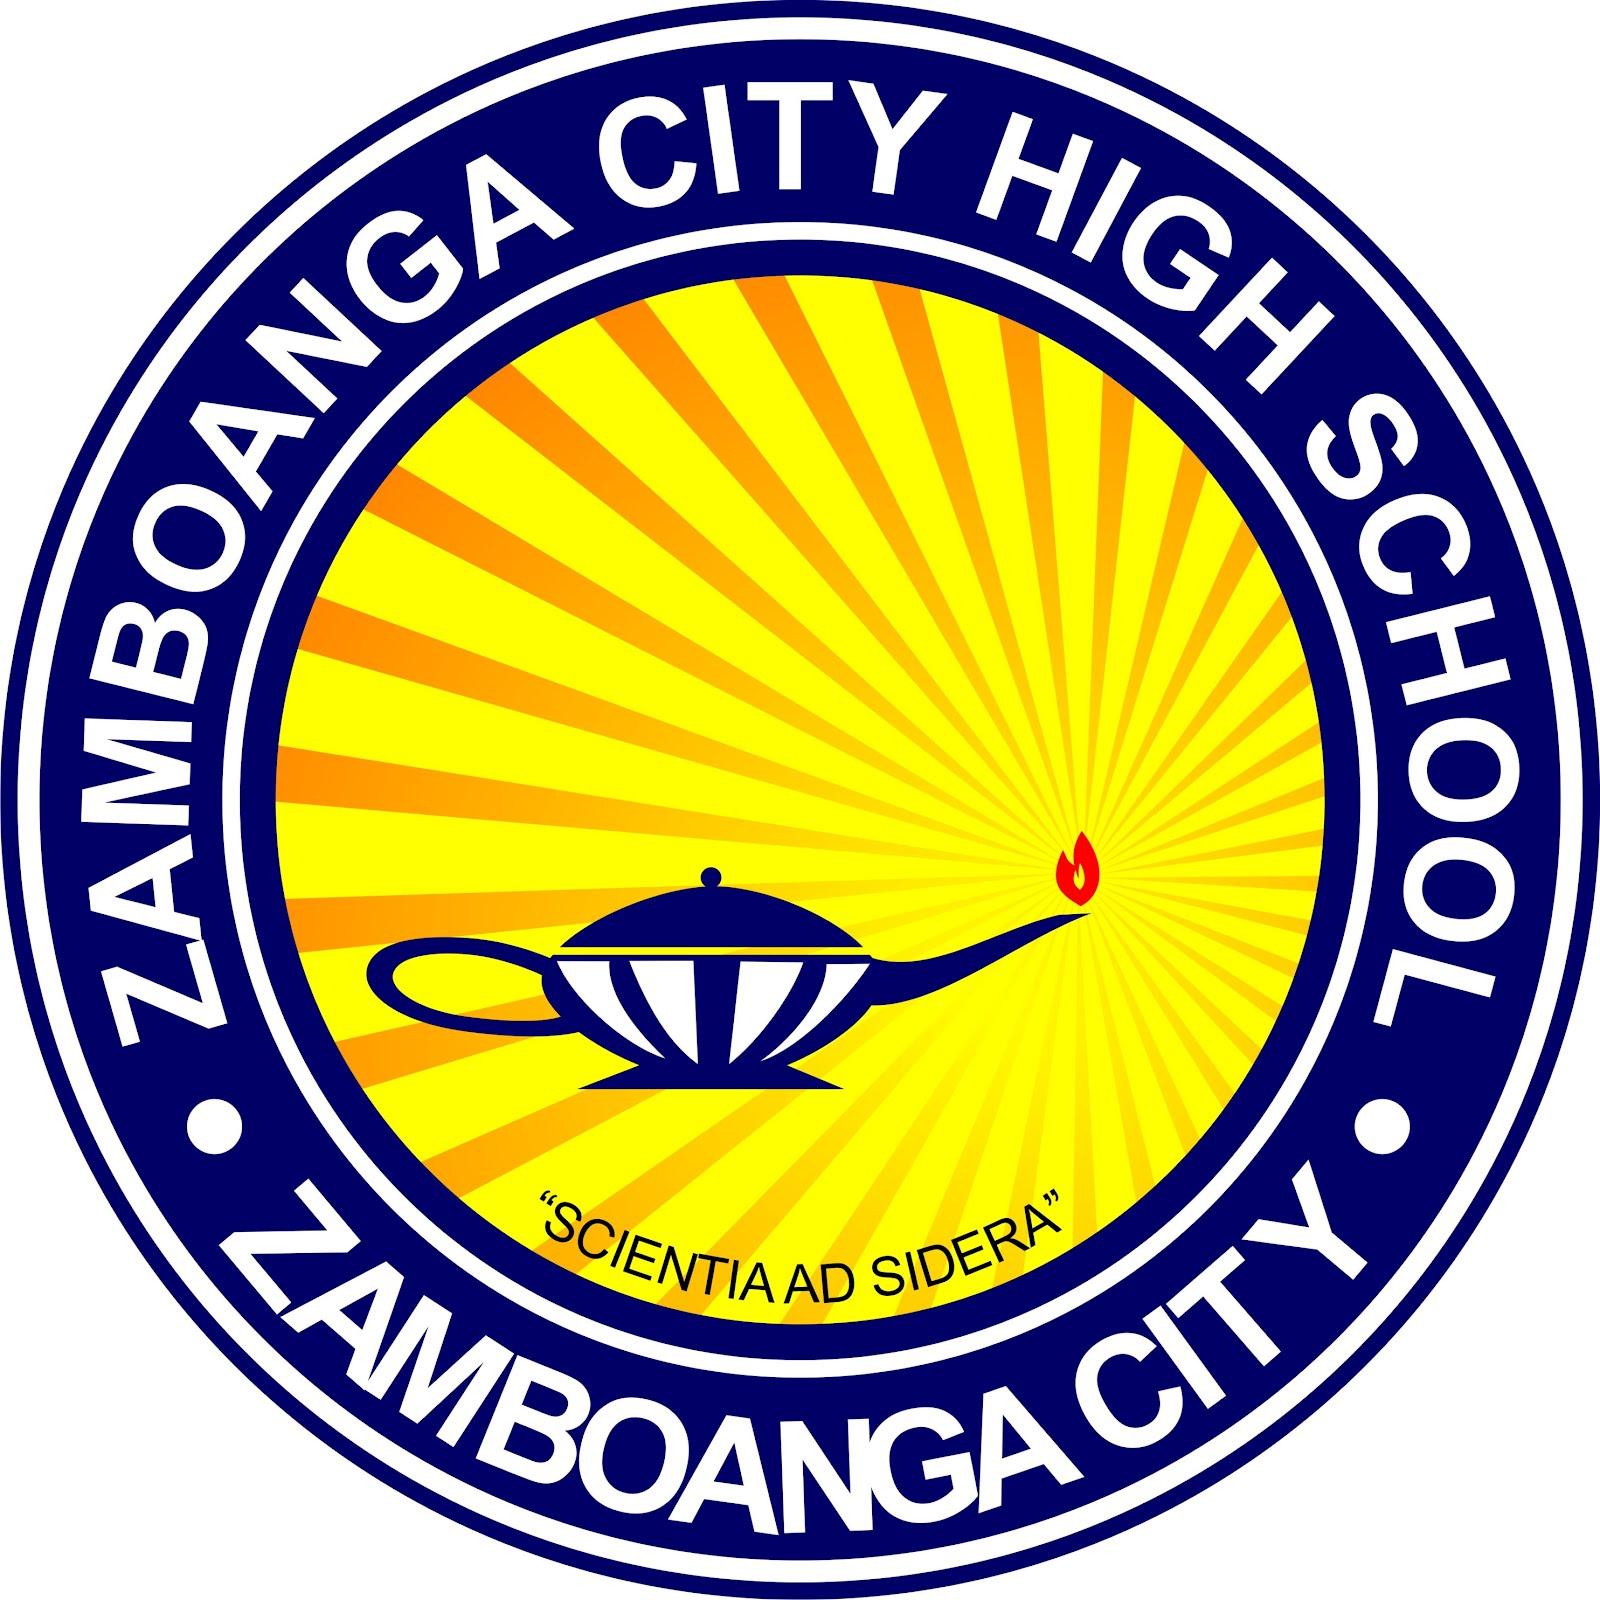 zamboanga city chat Meet filipino single girls online, women from the philippines seeking men, filipino ladies looking for partner, free online dating at pinay romances.